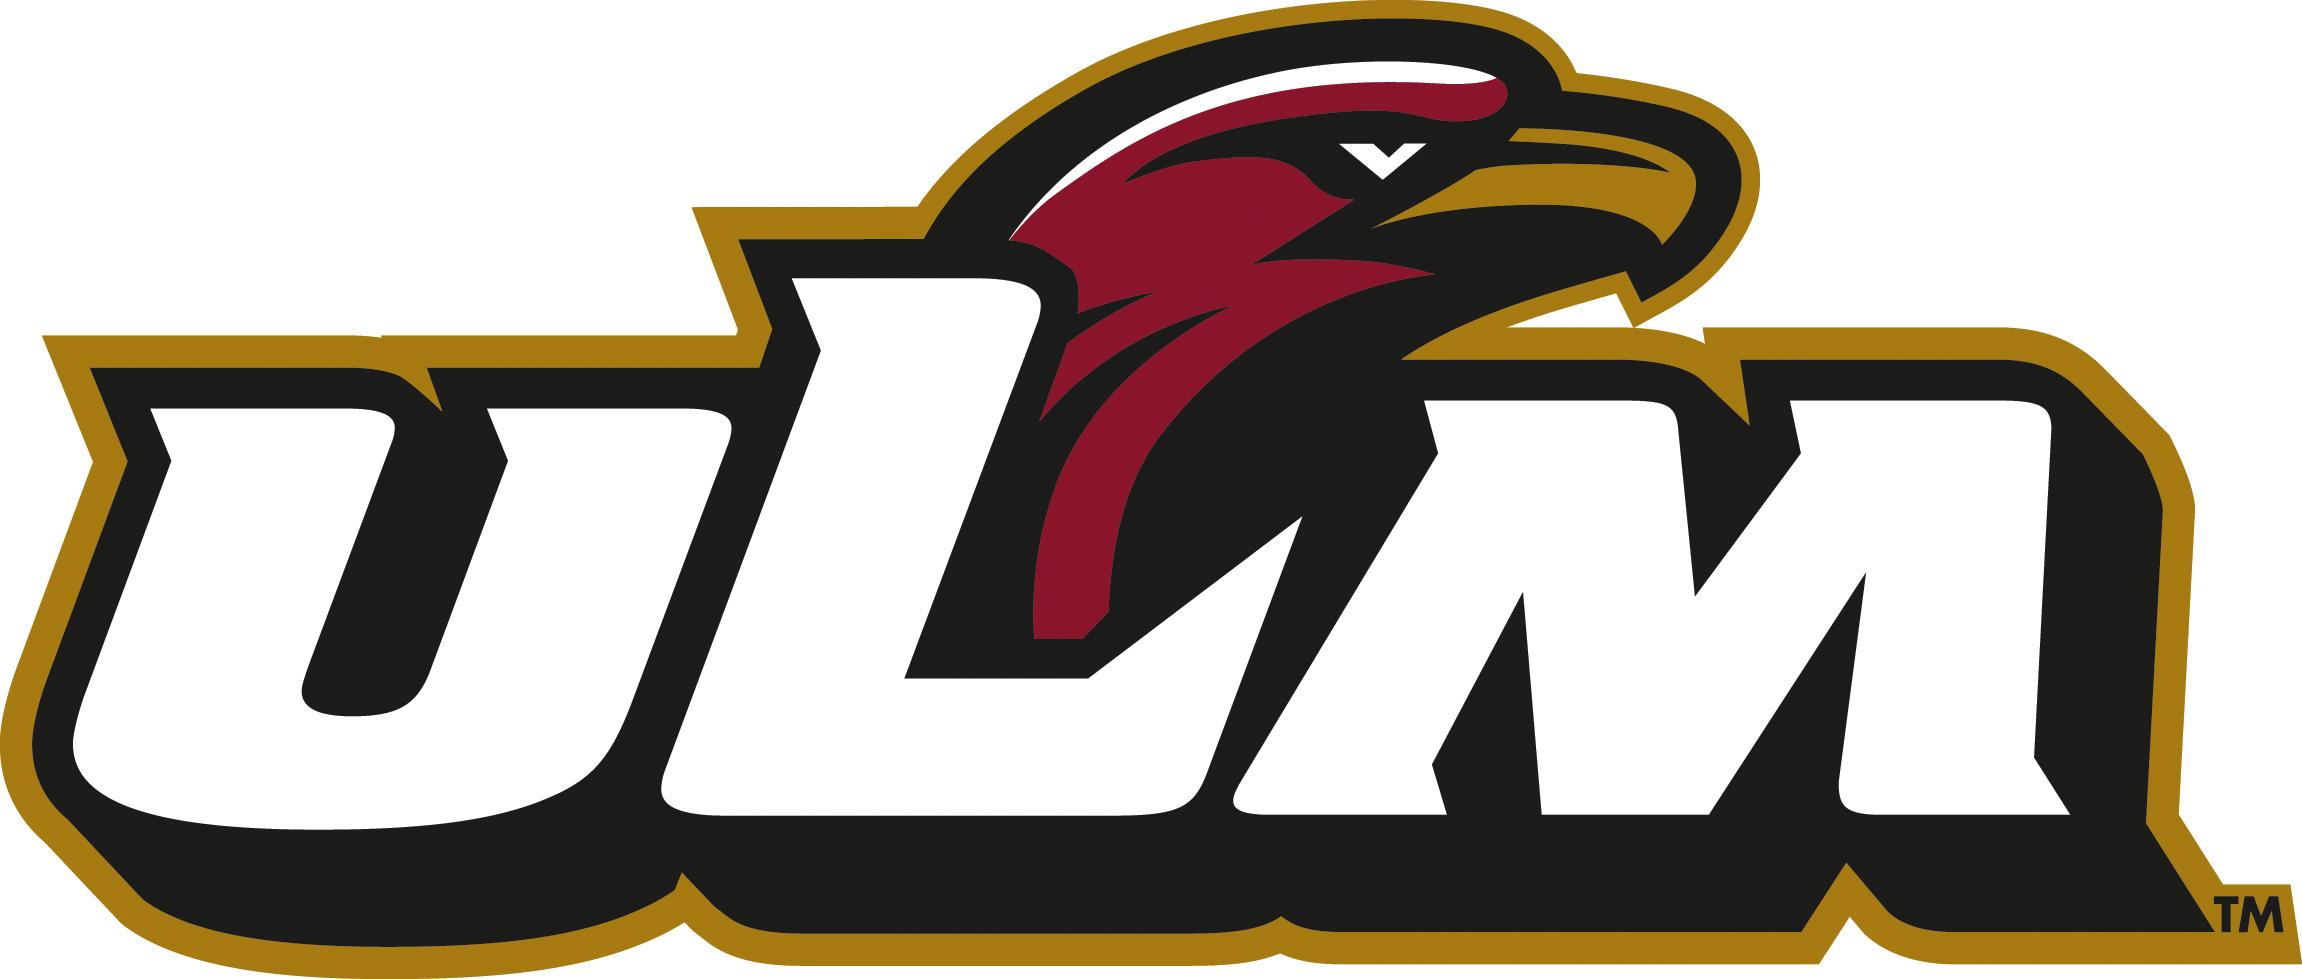 Ulm Logos.